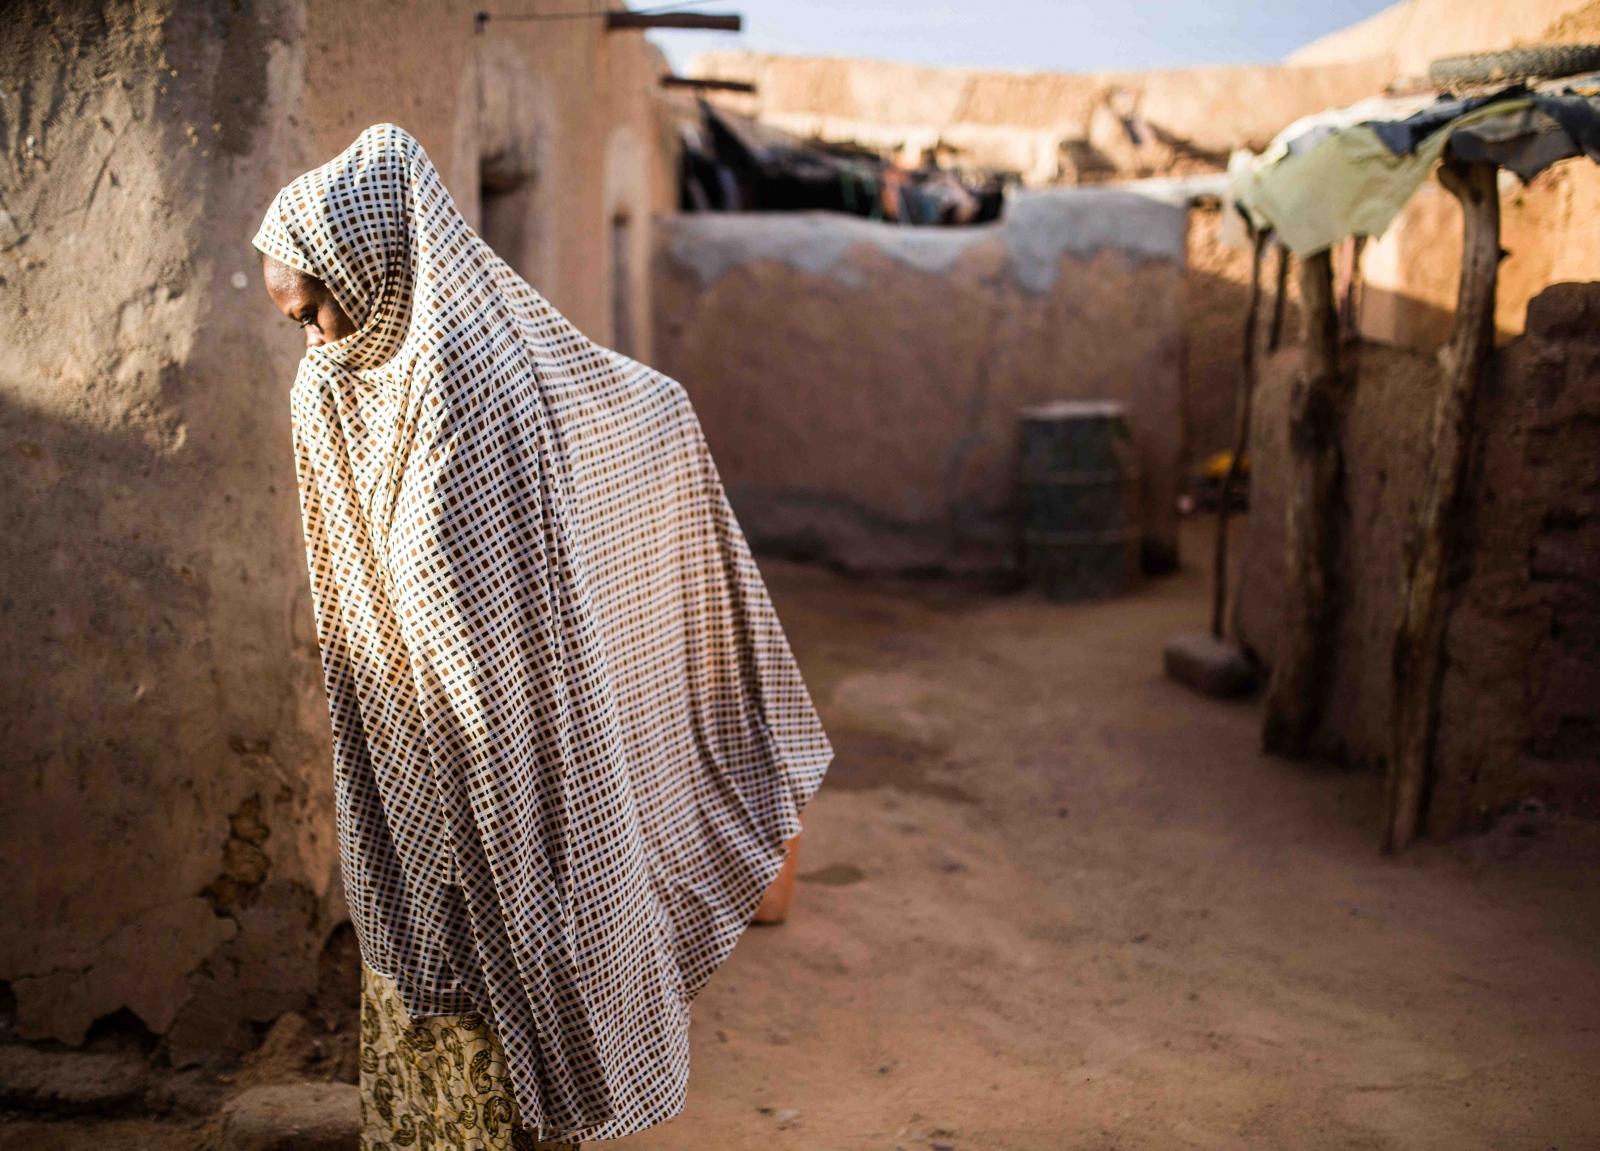 Photography image -  Agadez, Níger.  #photography   #photojournal   #photojournalist  #photodocumentary   #fotoperiodismo   #everydayafrica   #canon   #migration  #migracion   #fotografia